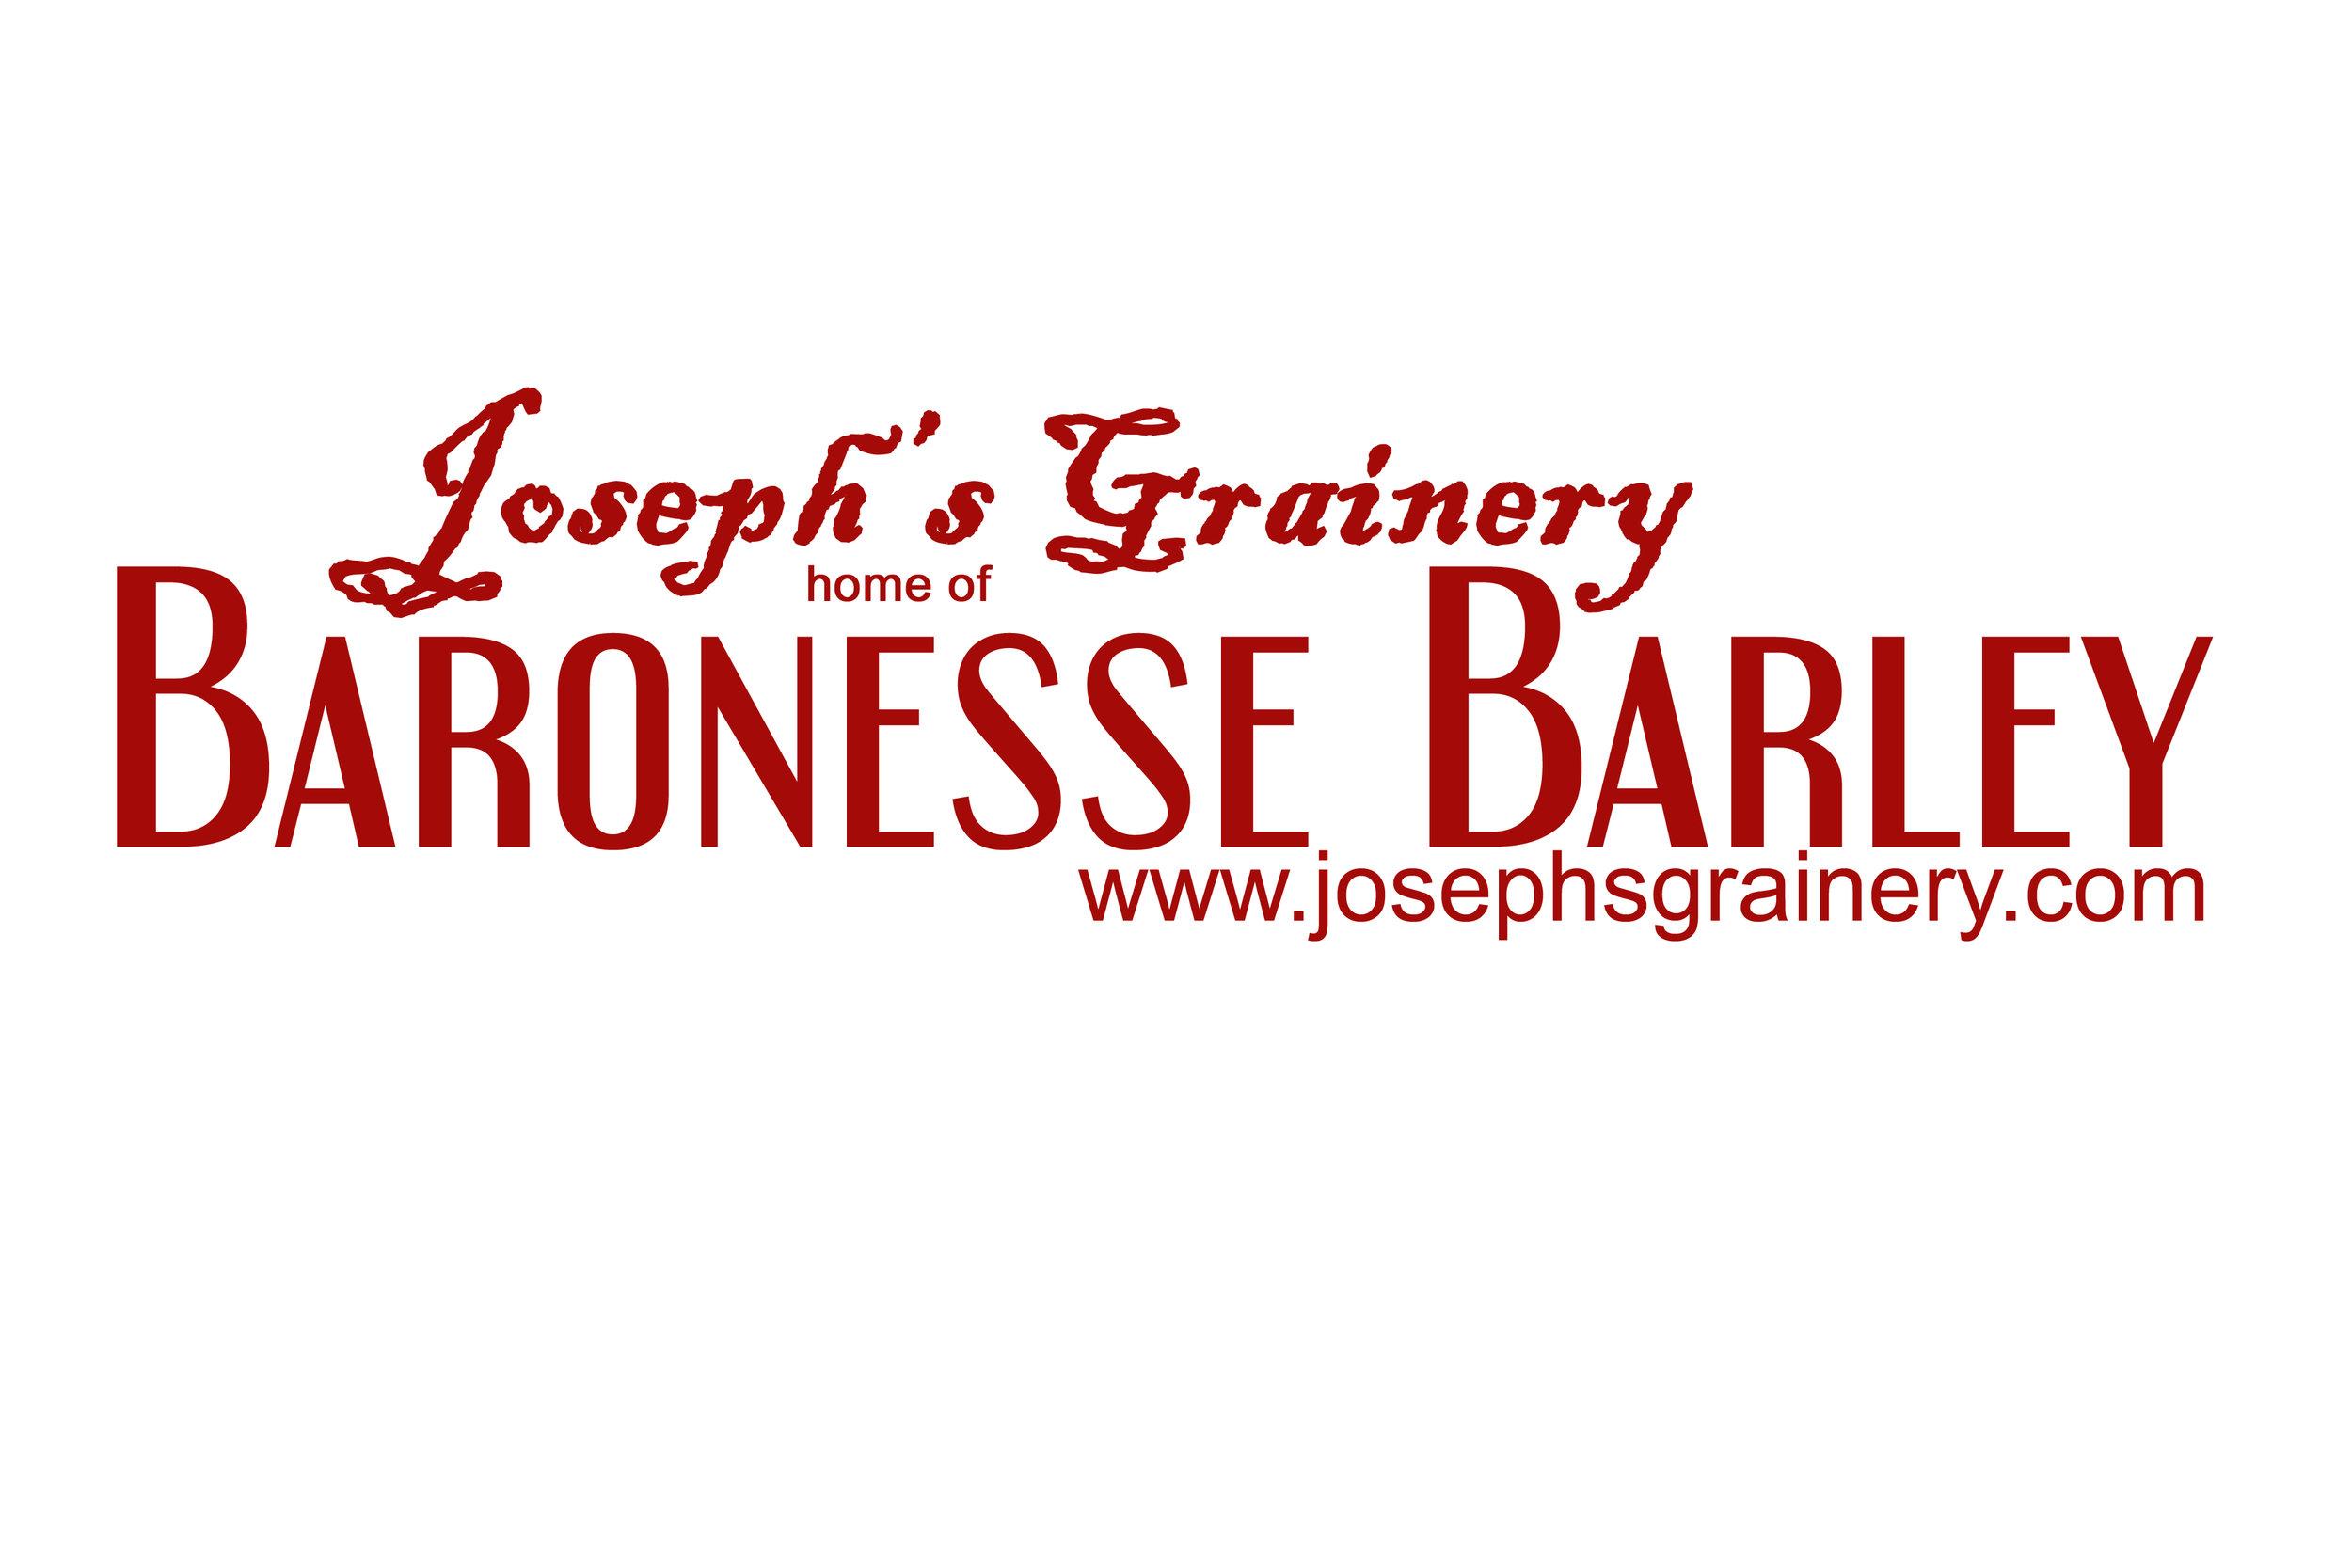 Joseph's Grainery home of Baronesse barley.jpg